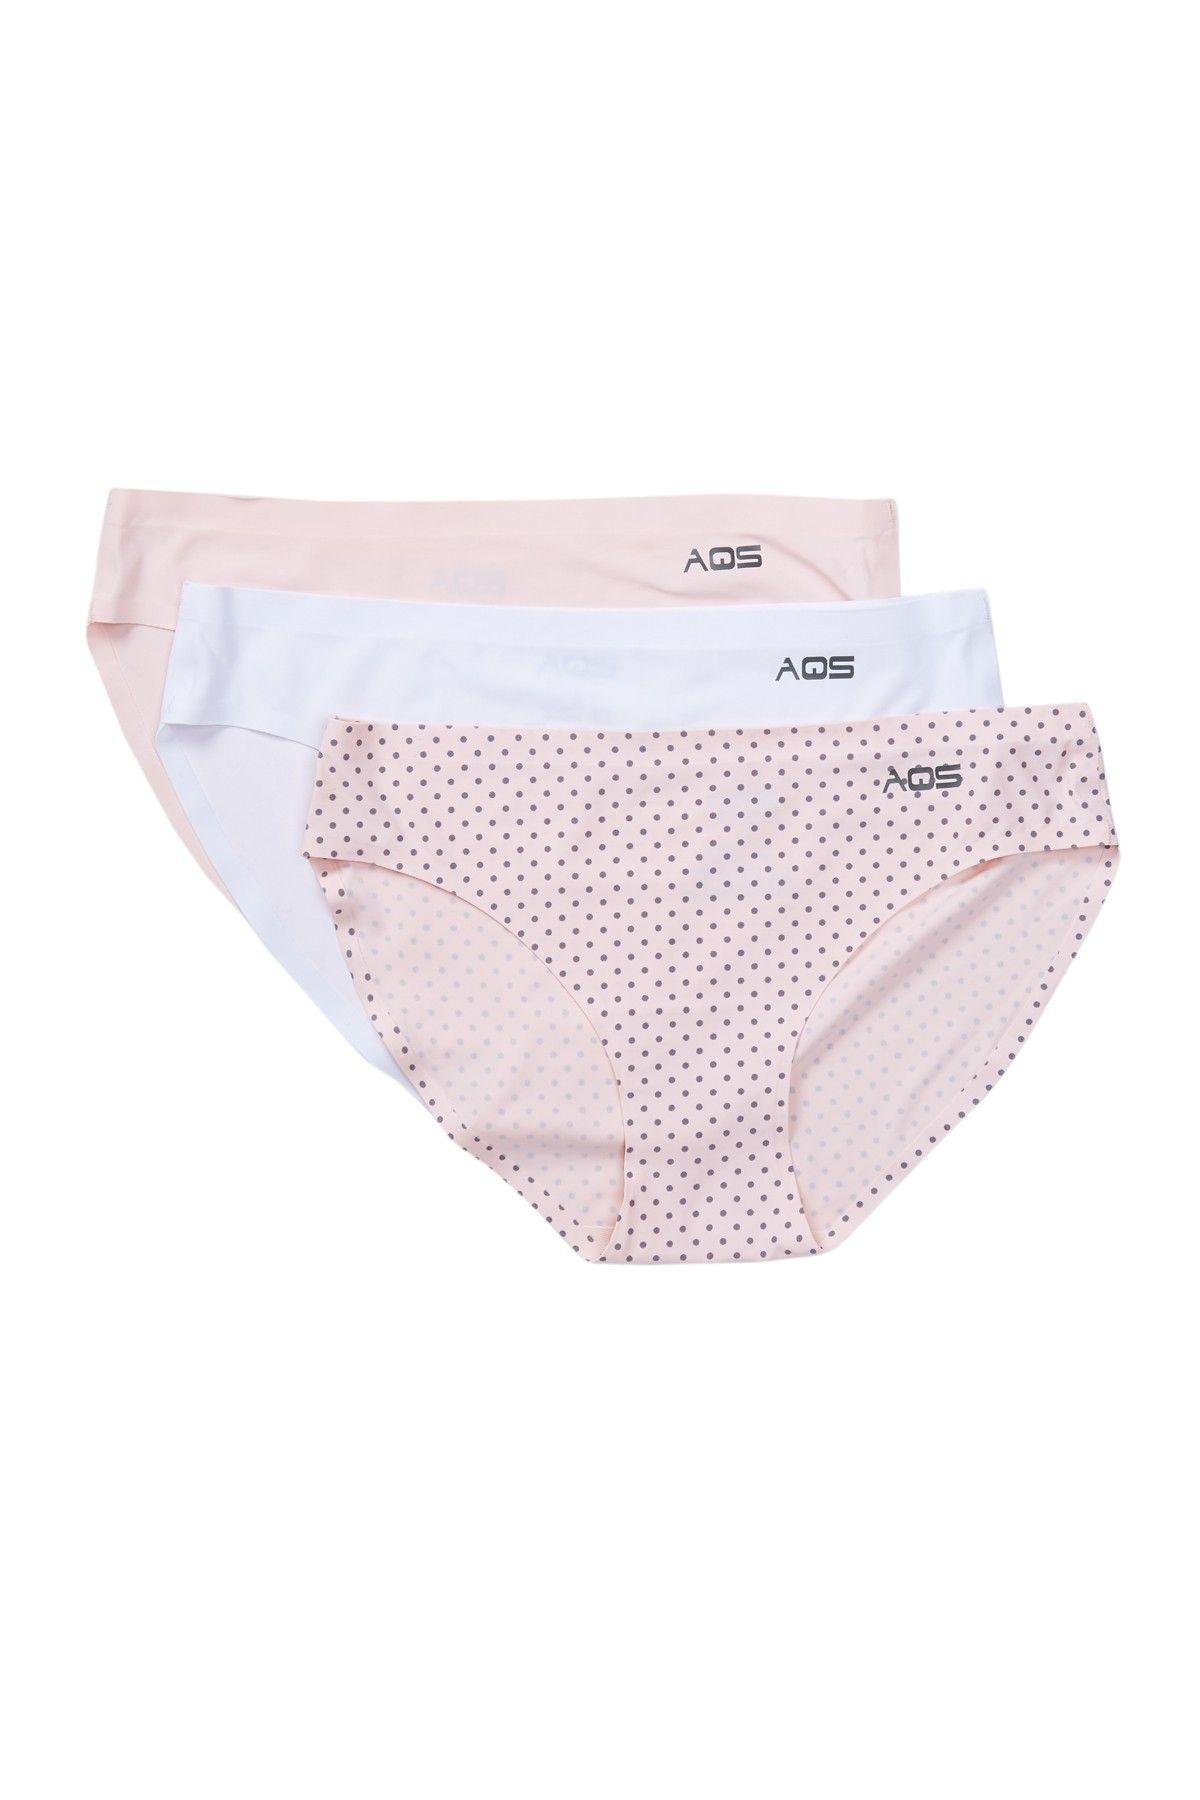 04561f05b673c Assorted Seamless Bikini Cut Panties - Pack of 3